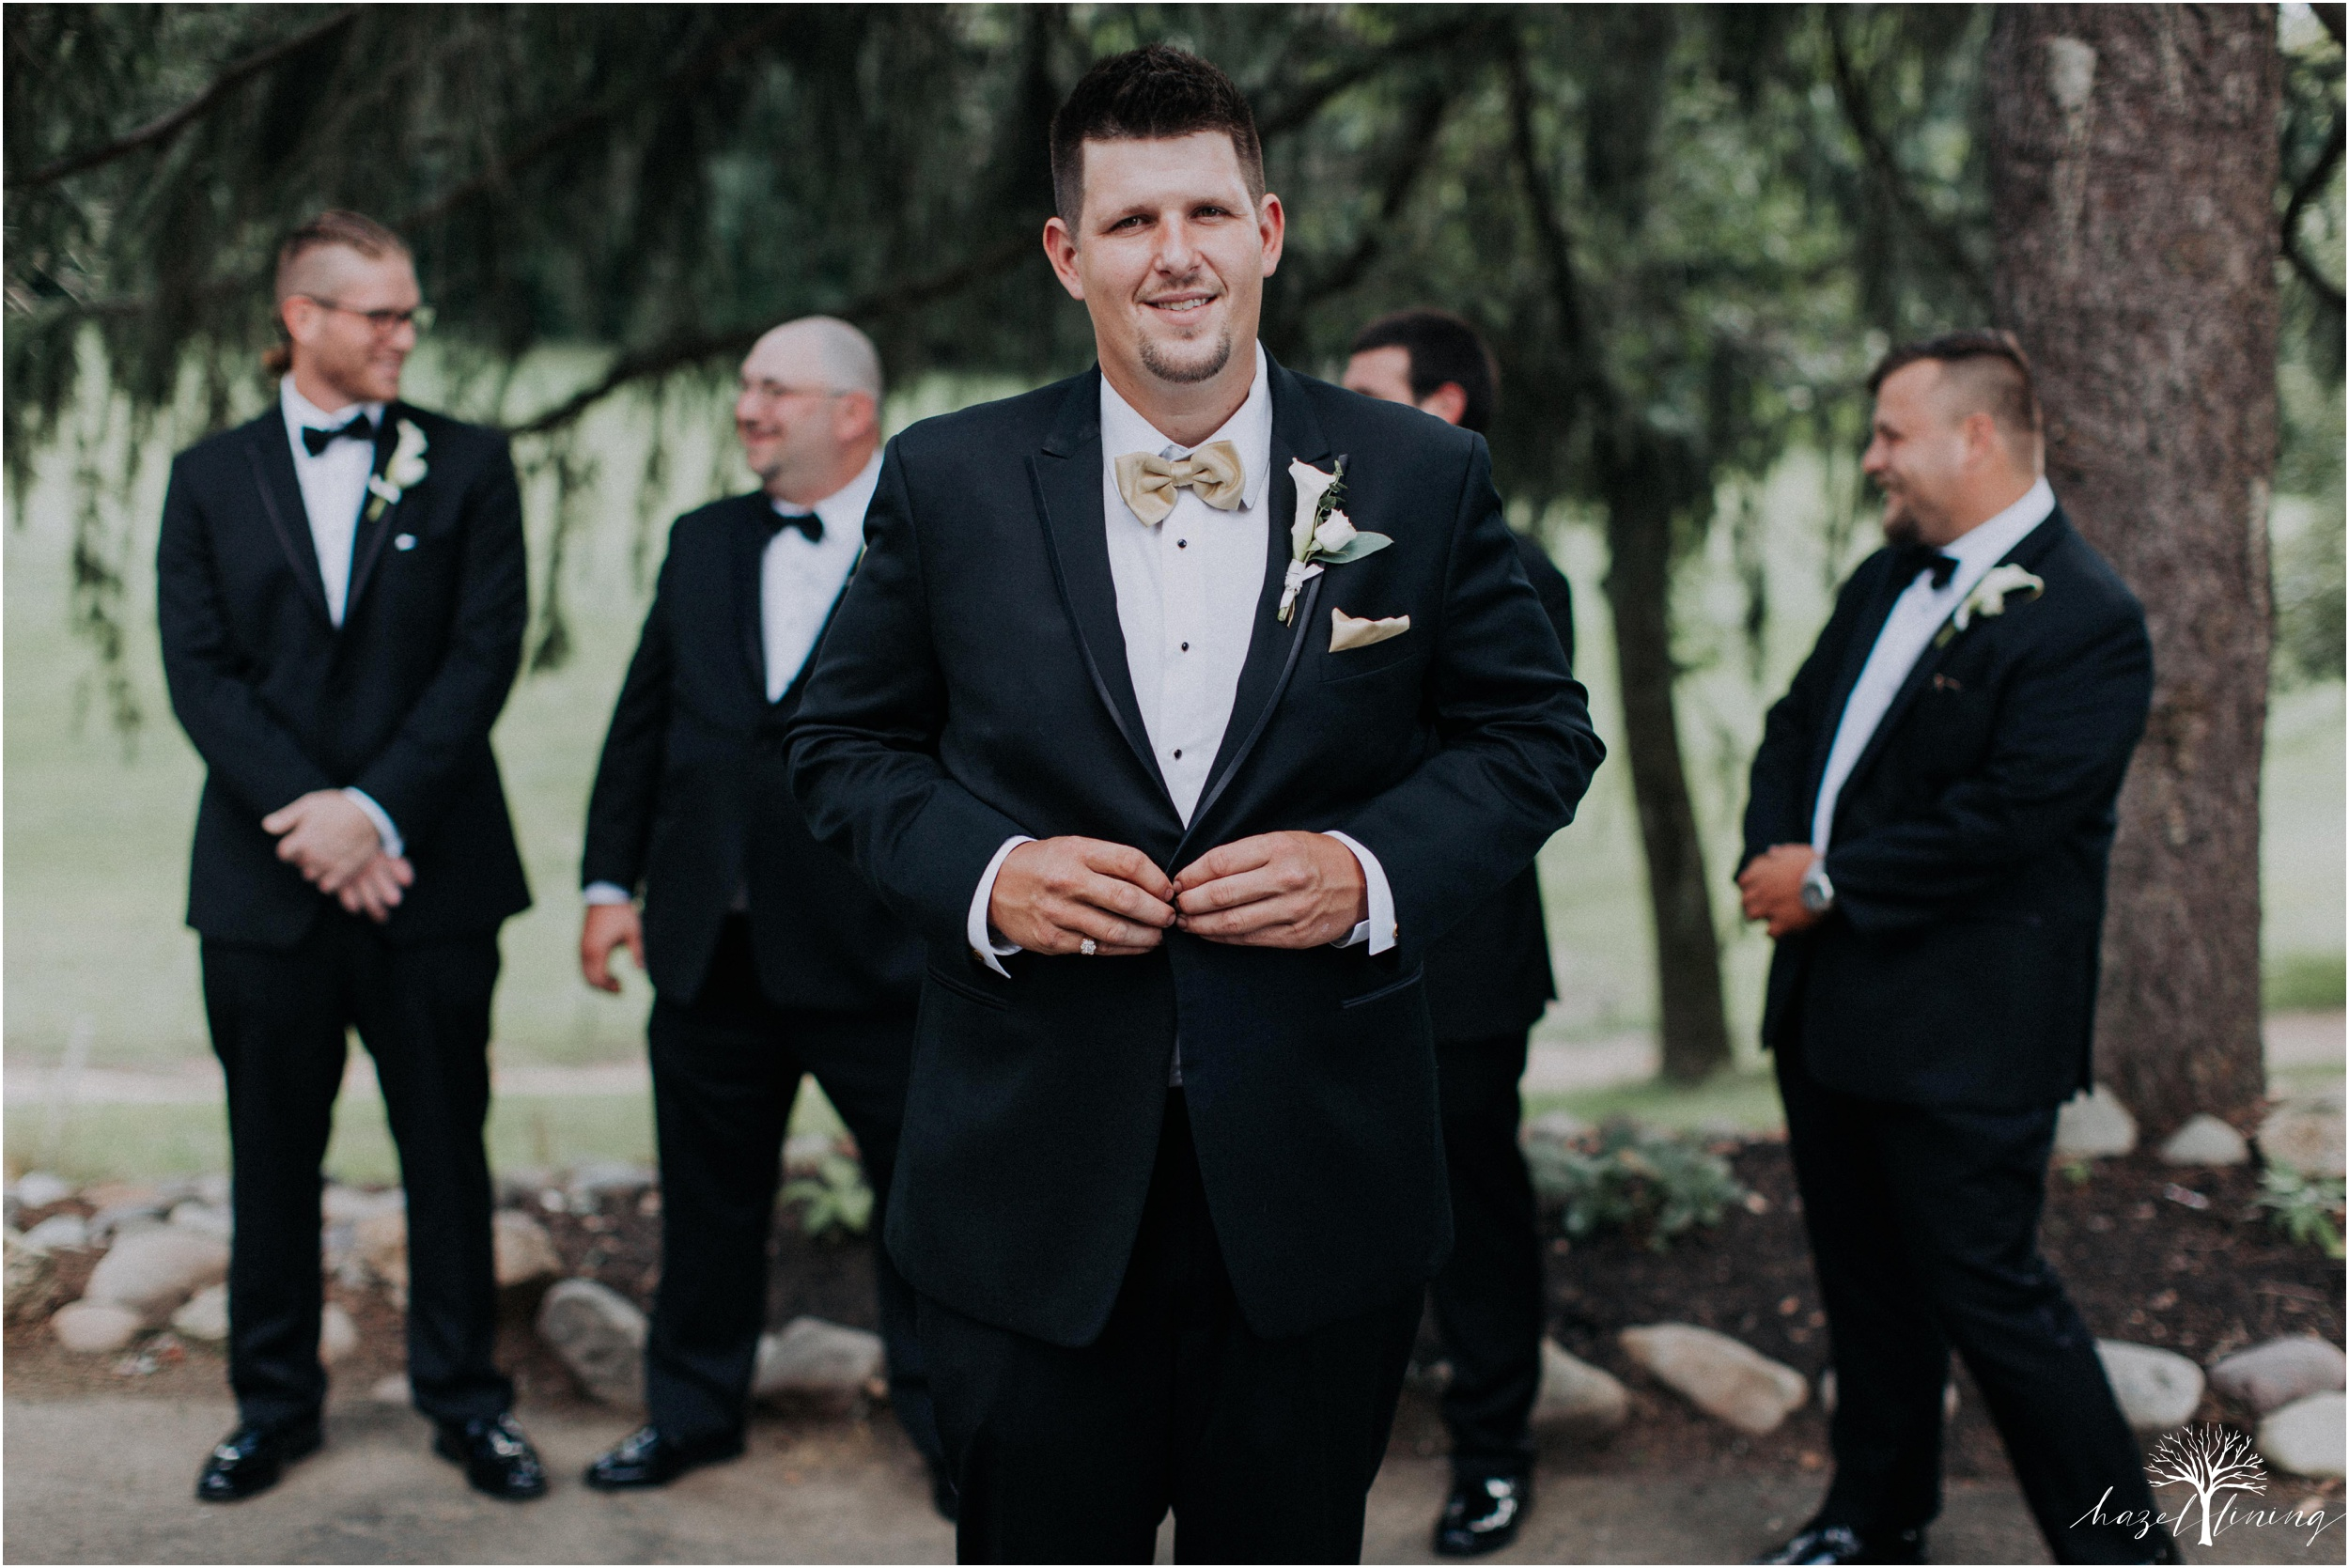 elizabeth-doelp-andrew-foreback-middletown-country-club-summer-langhorne-pennsylvania-wedding-hazel-lining-travel-wedding-elopement-photography_0069.jpg